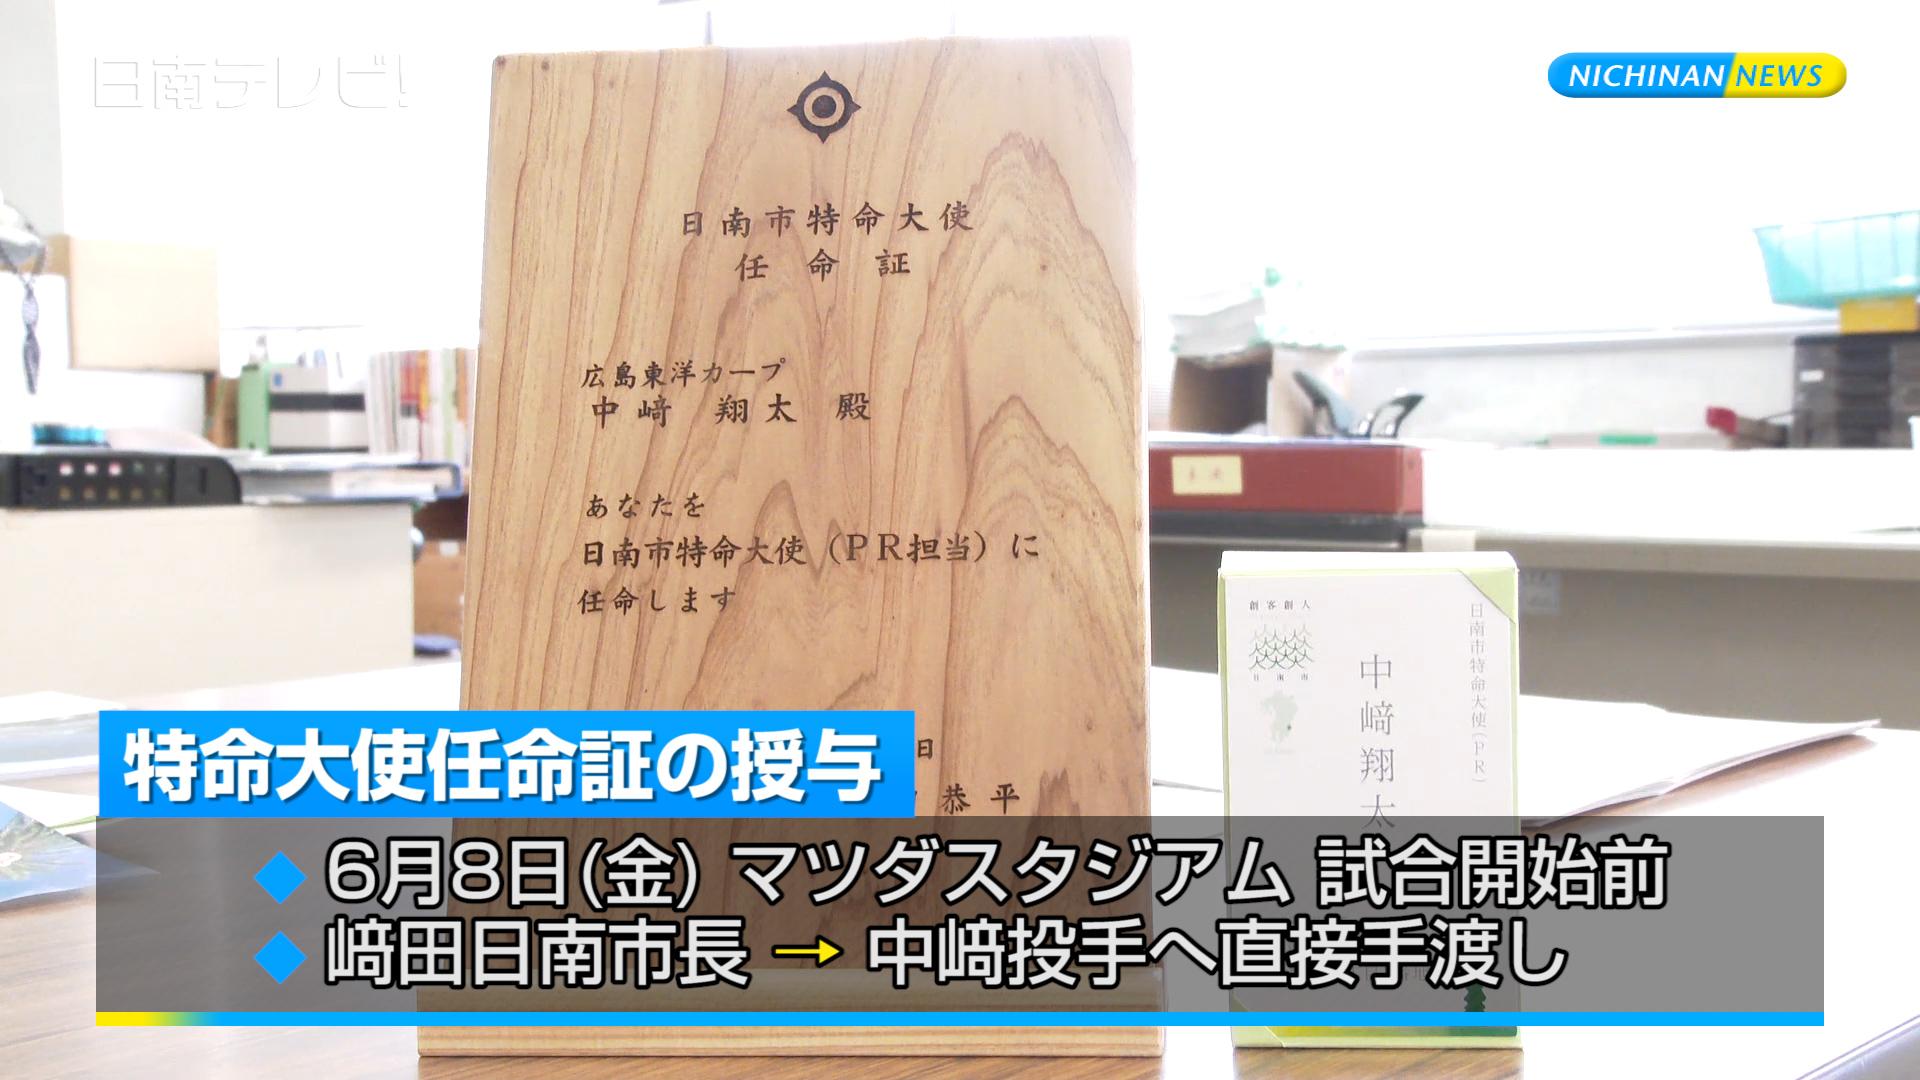 広島カープ中﨑投手 日南市特命大使に任命